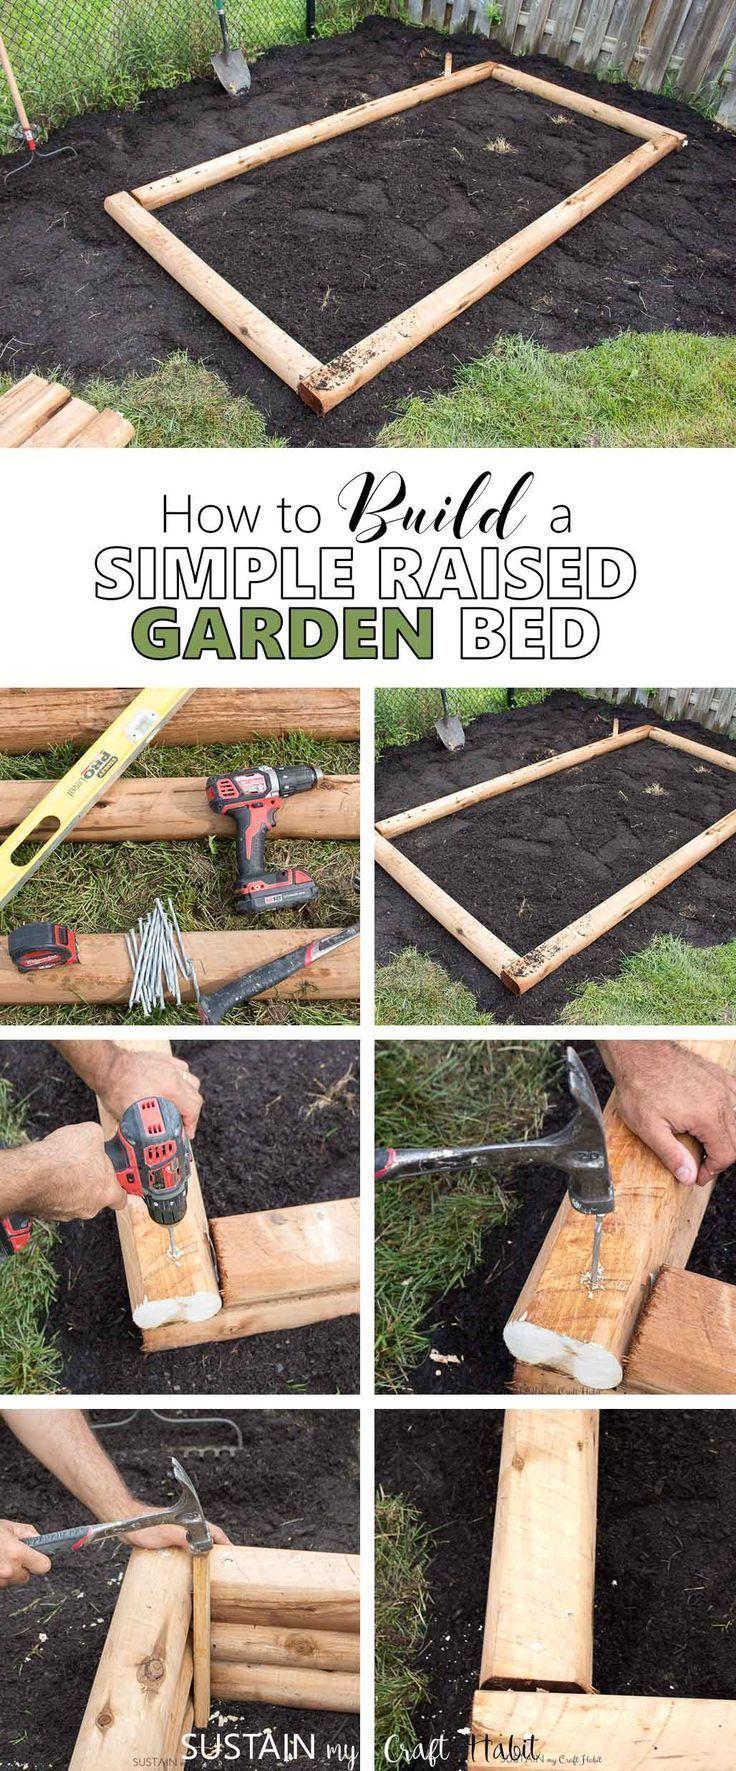 Collage Of Steps To Build Your Own Raised Garden Bed From Sustain My Craft Habit Summerideas Summe Diy Raised Garden Building A Raised Garden Raised Garden